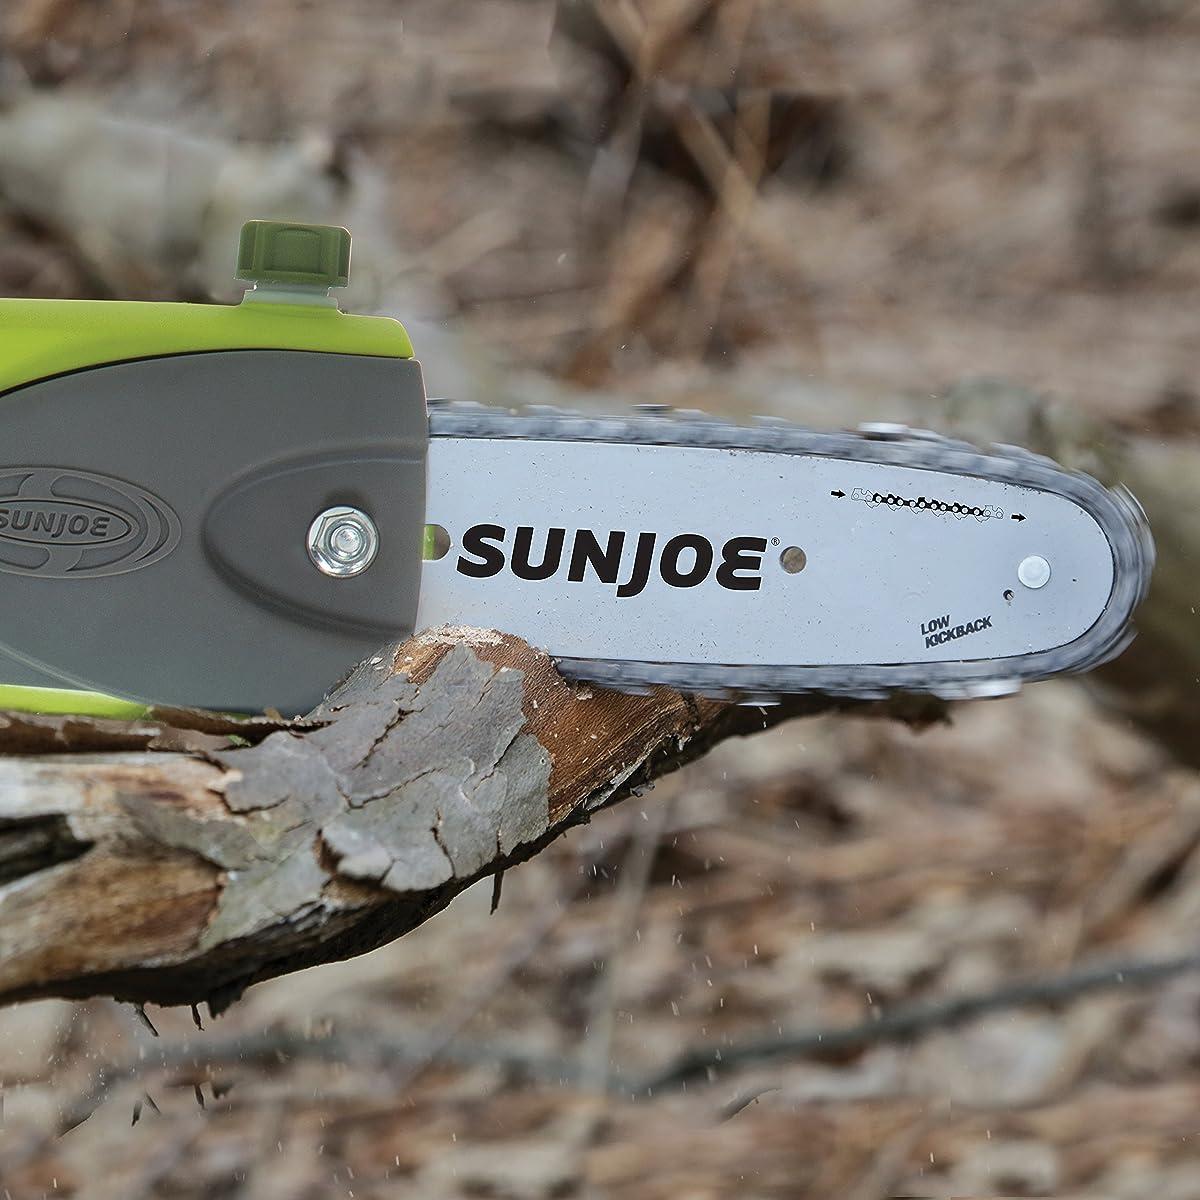 "Sun Joe iON8PS2 40V 4.0 Ah 8"" Telescoping Pole Chain Saw with Brushless Motor"